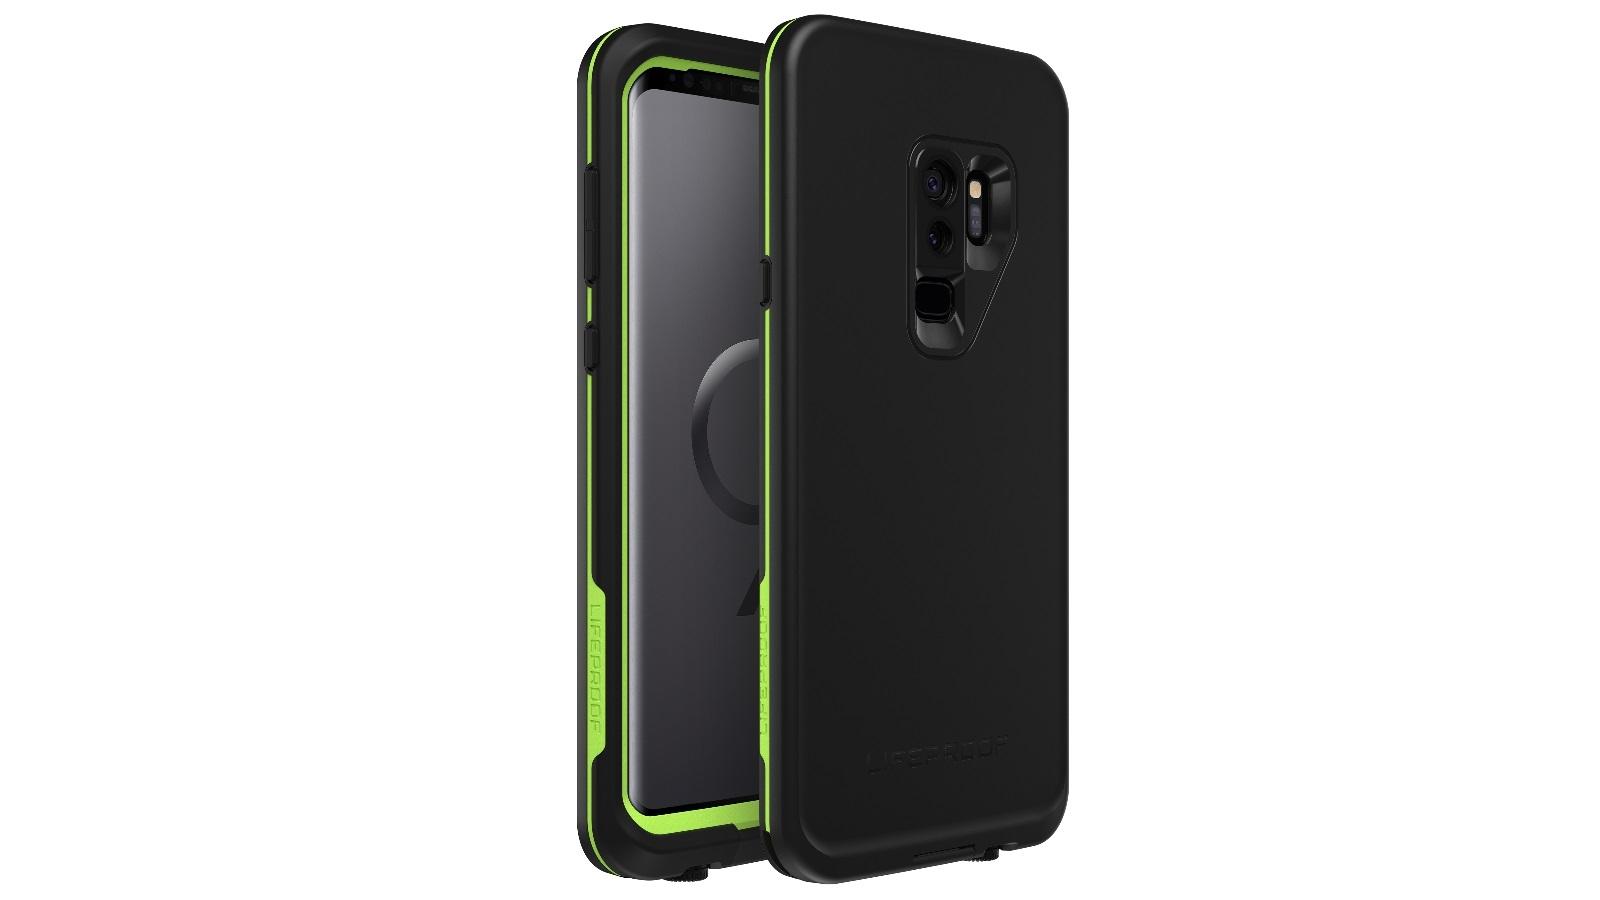 wholesale dealer 36156 63367 Lifeproof Fre Samsung Galaxy S9 Plus Case - Black/Lime